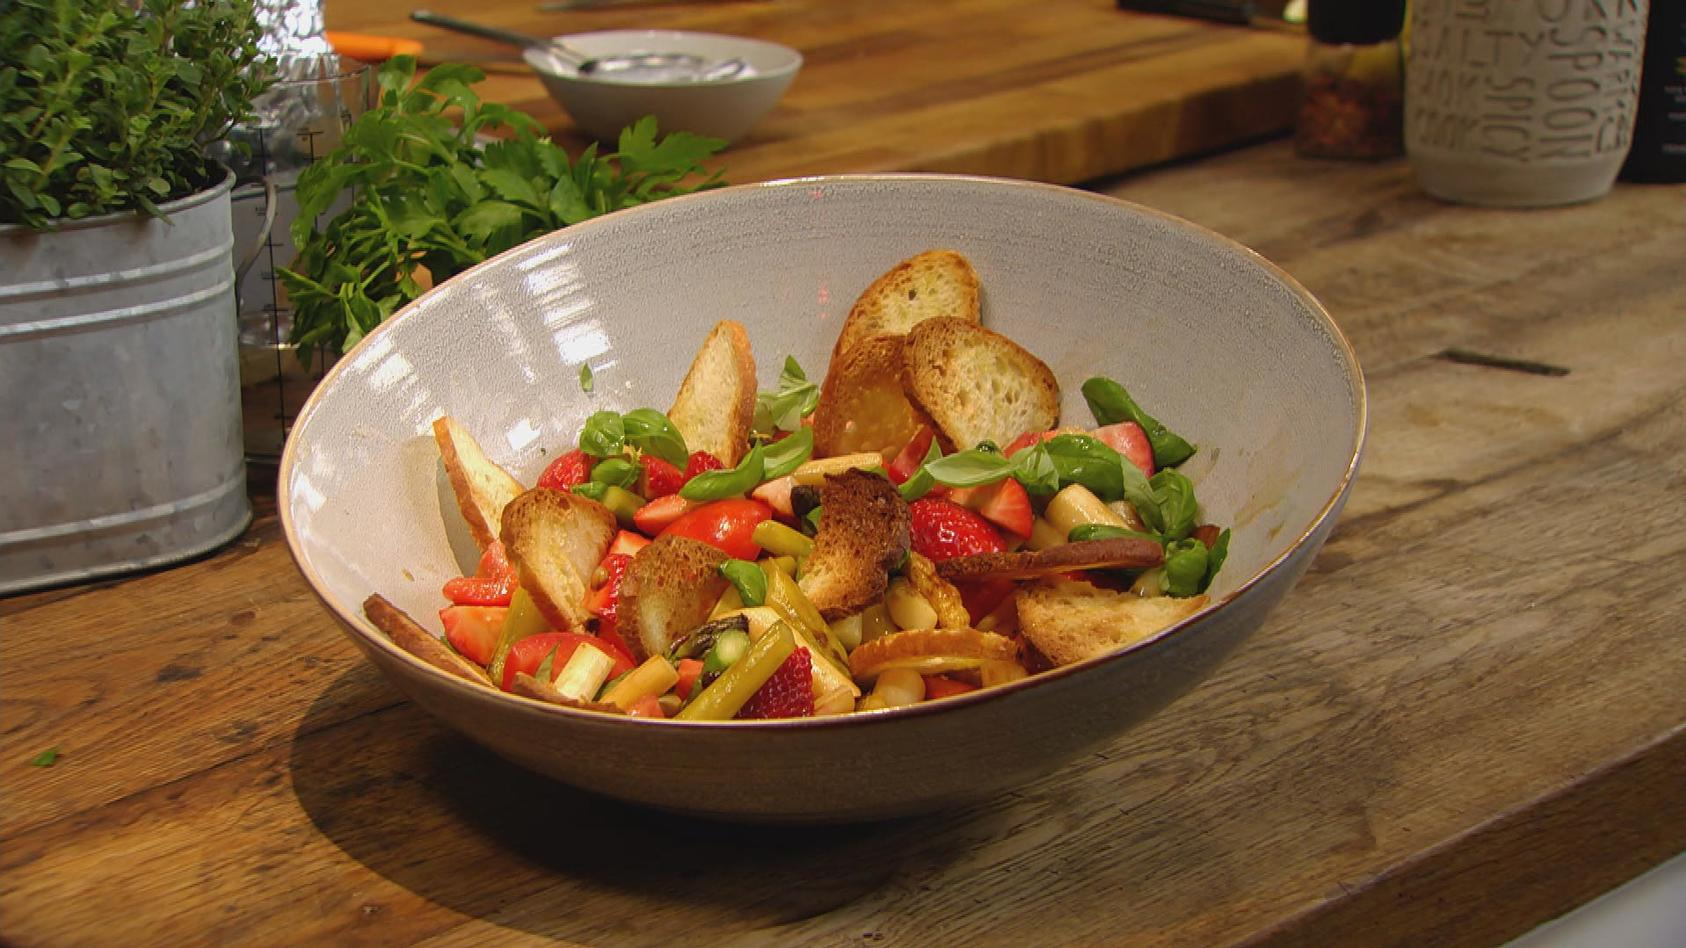 Kreative Küche – Clever kombiniert: Spargel-Brotsalat mit Erdbeeren